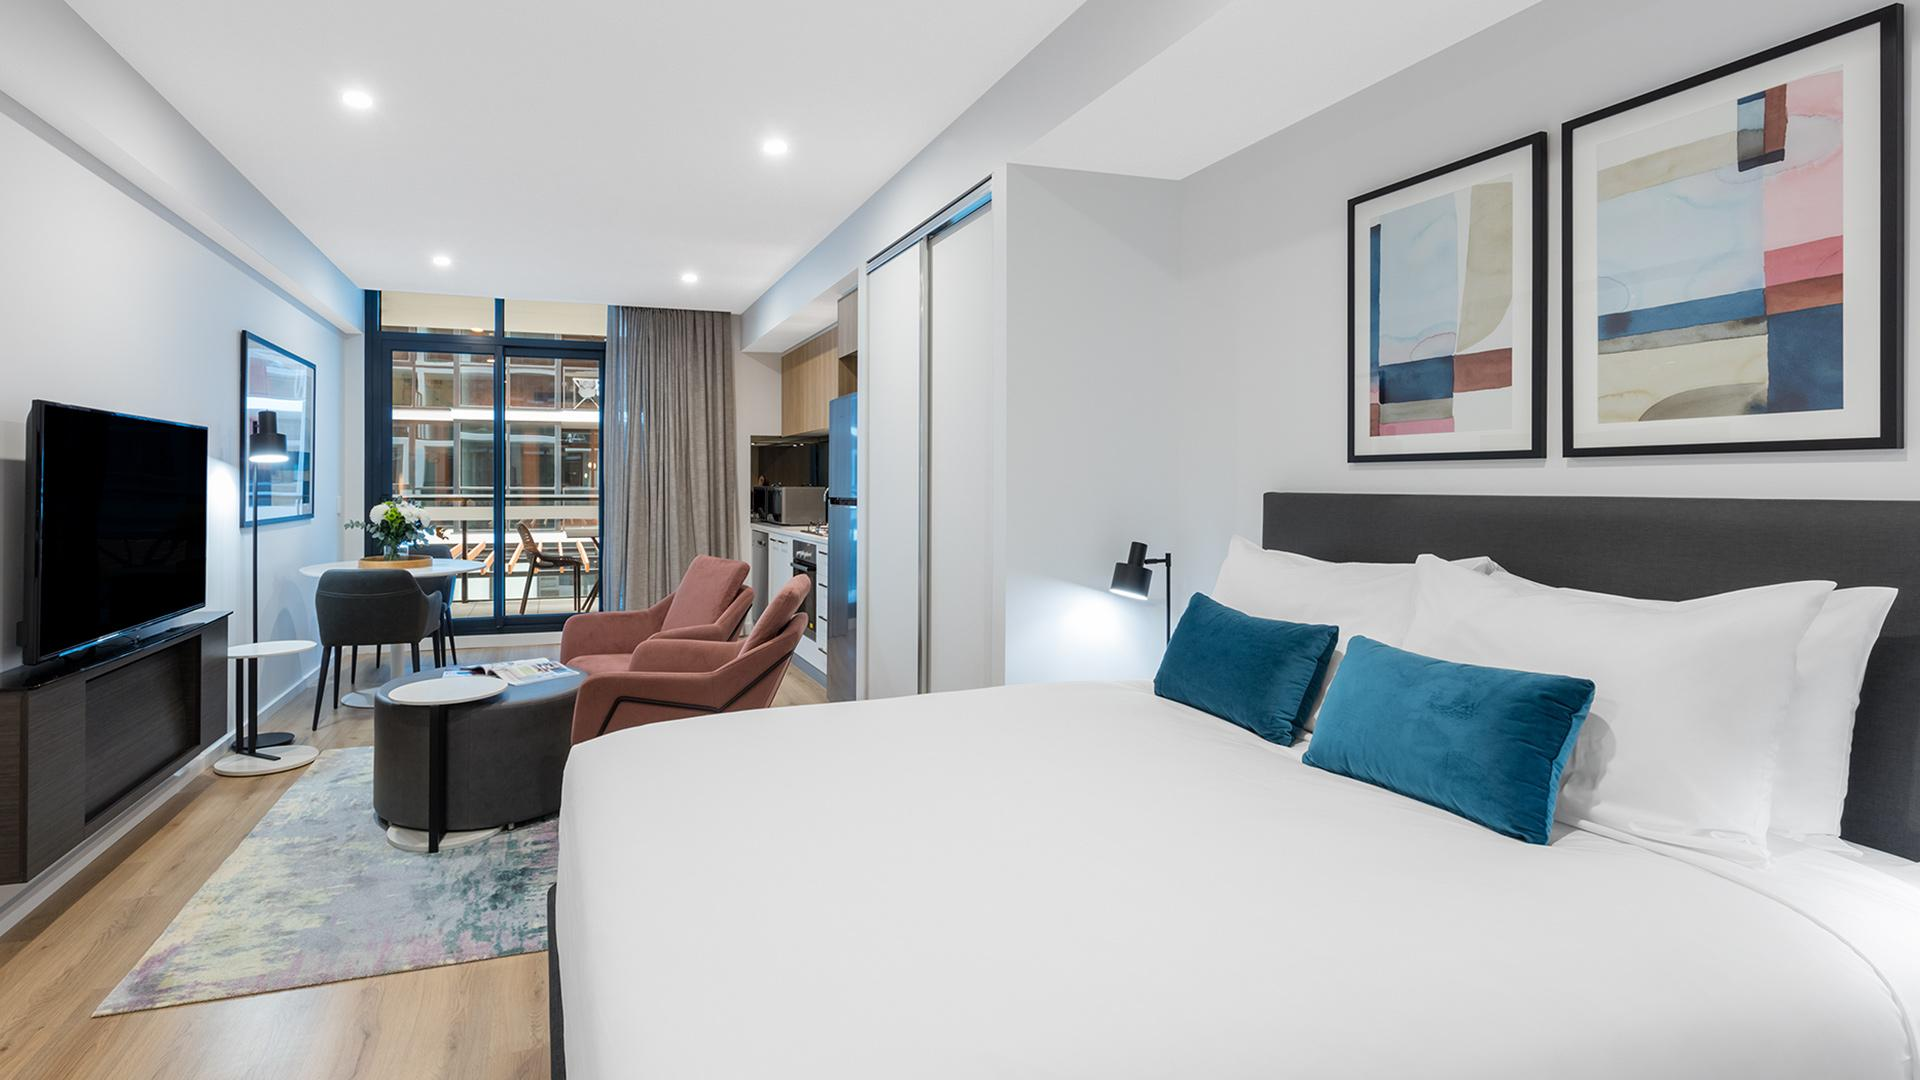 Avani Room image 1 at Avani Adelaide Residences by Adelaide City Council, South Australia, Australia